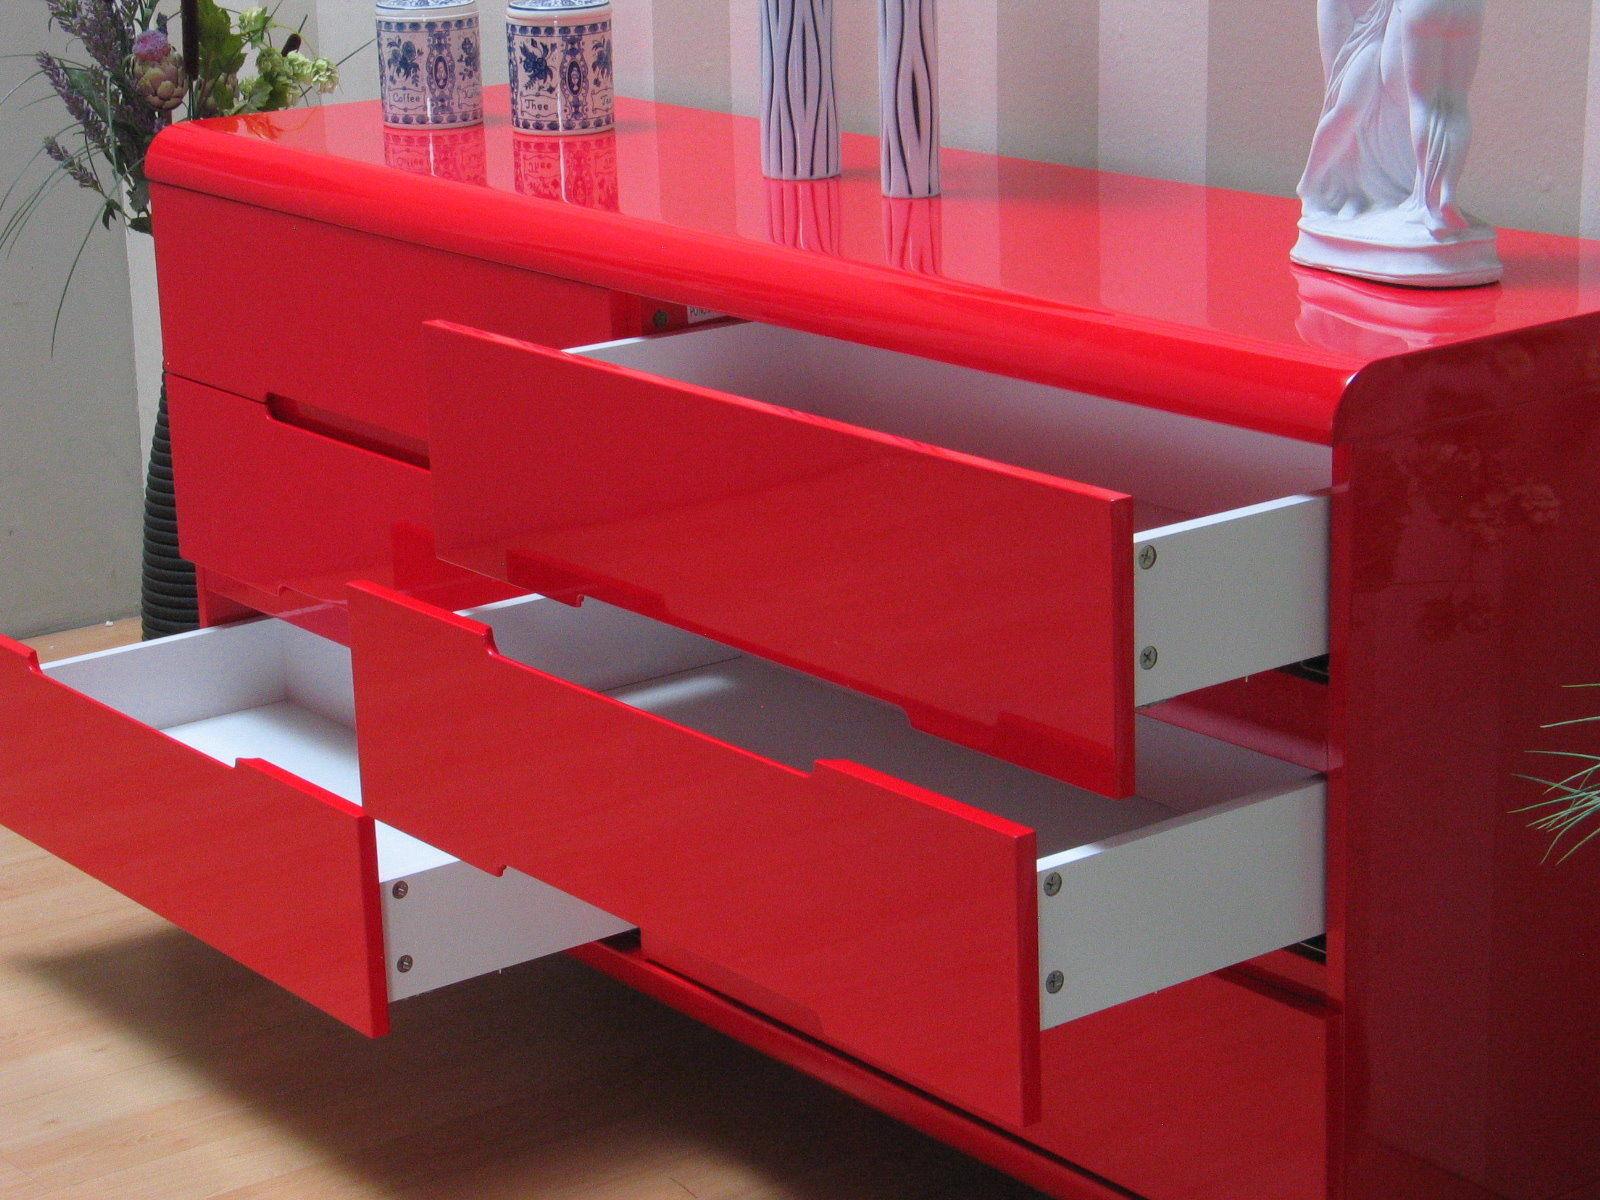 kommode spacy hochglanz rot schubladen schrank sideboard. Black Bedroom Furniture Sets. Home Design Ideas